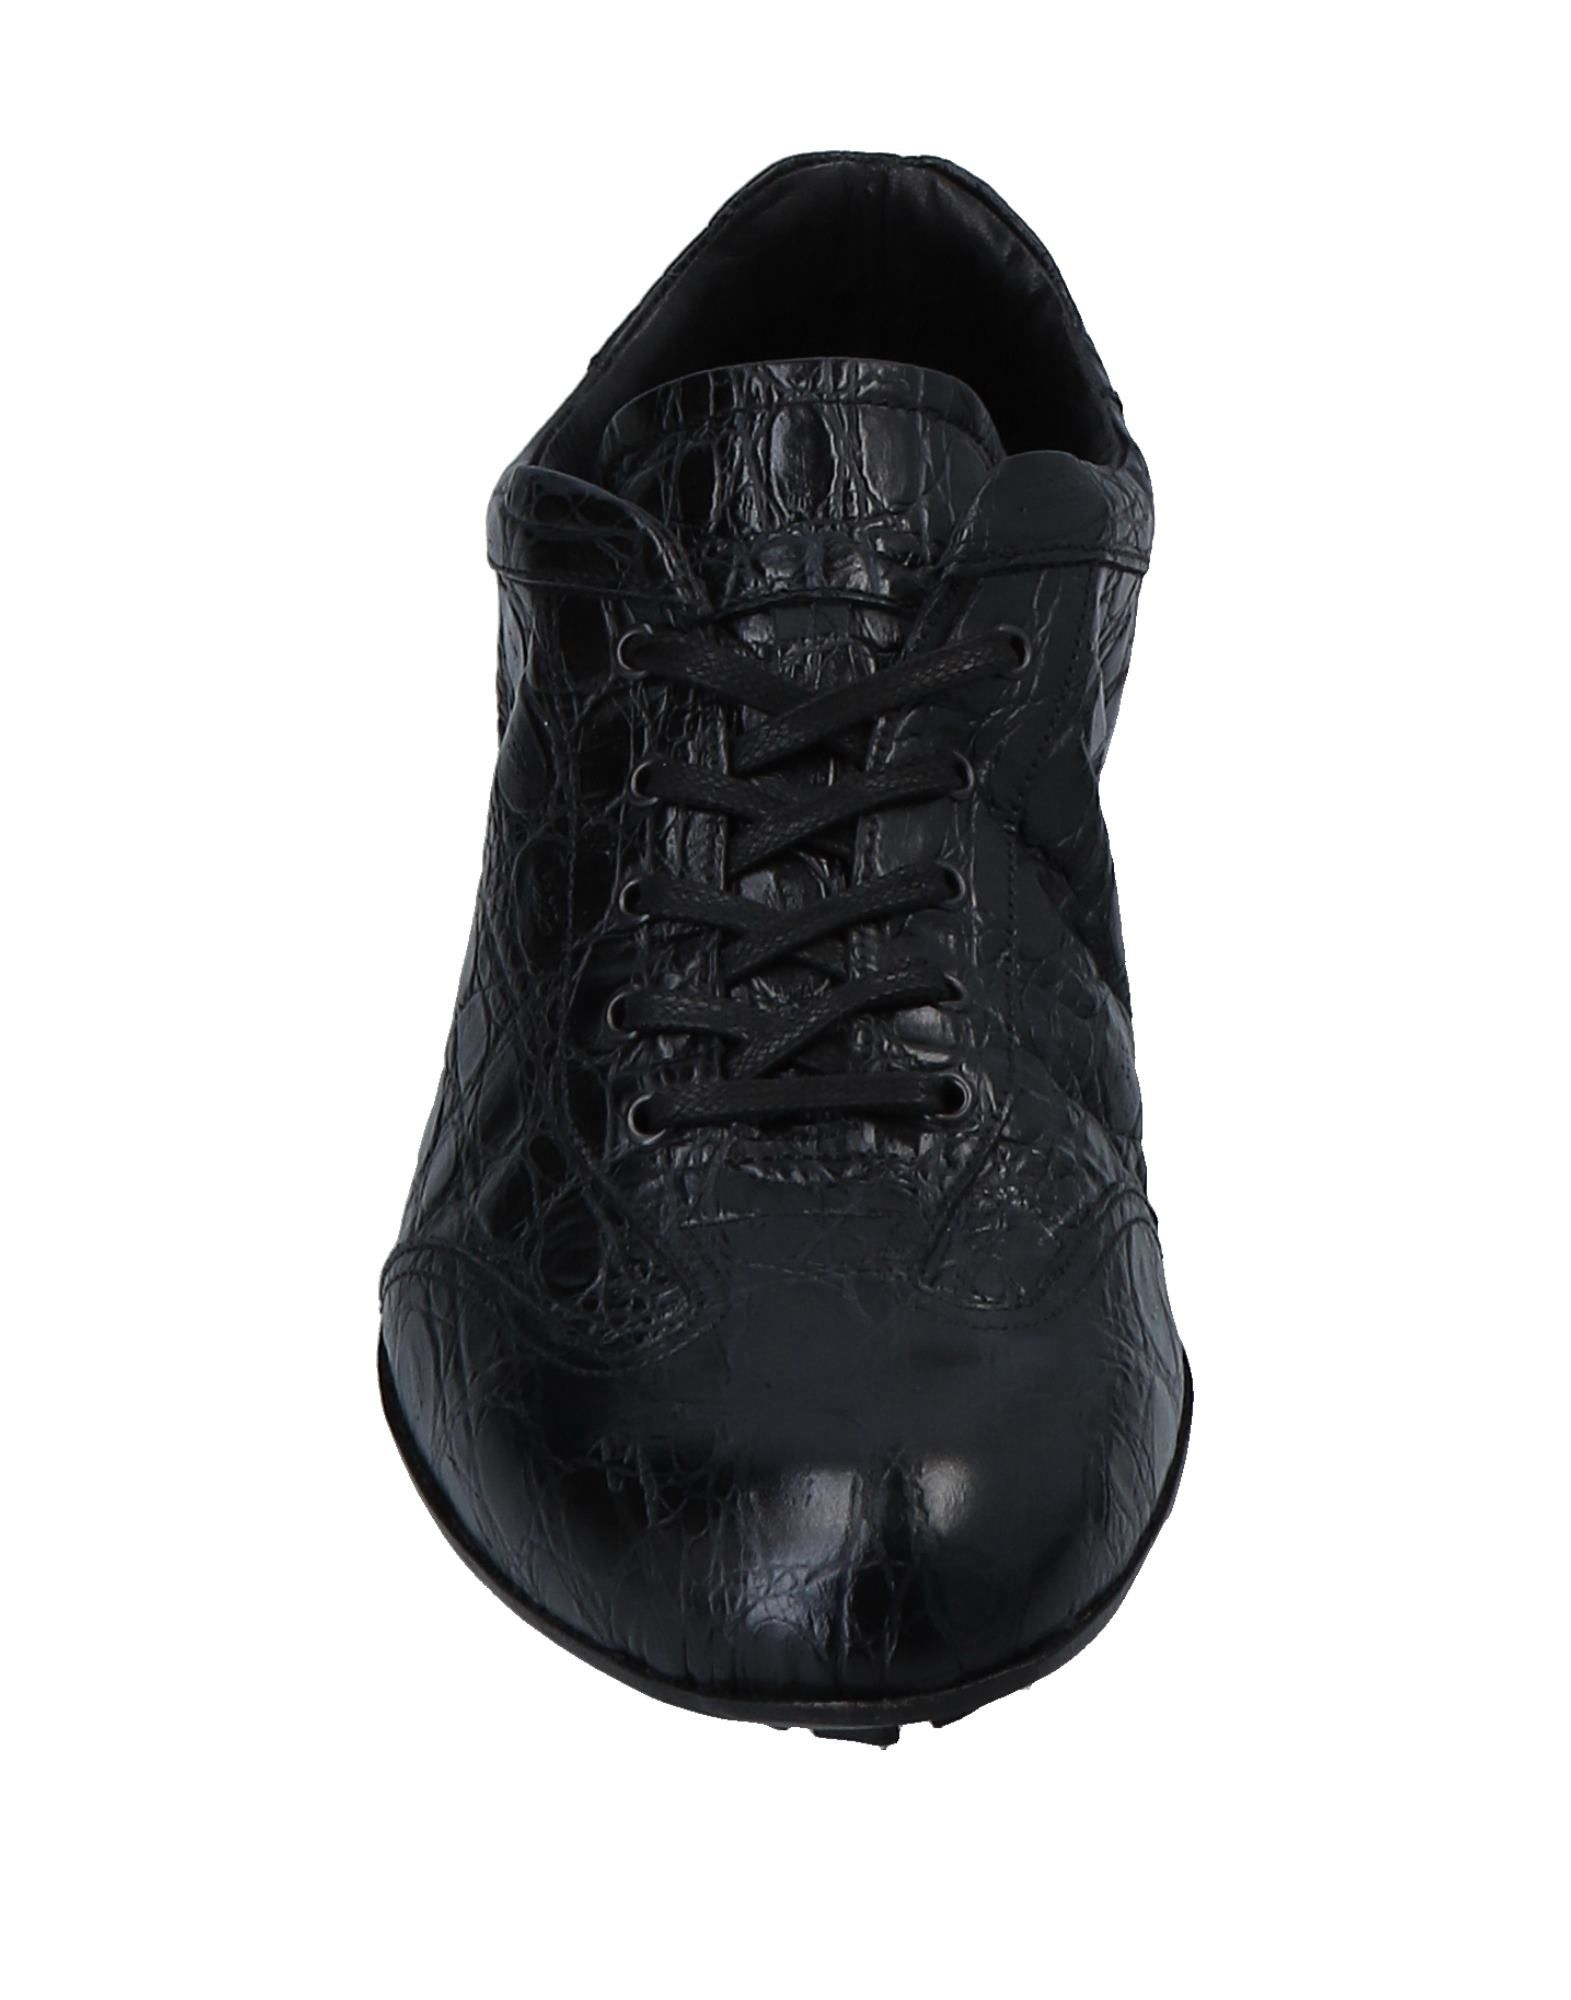 Baldinini Sneakers Herren Qualität  11554796VH Gute Qualität Herren beliebte Schuhe 830207